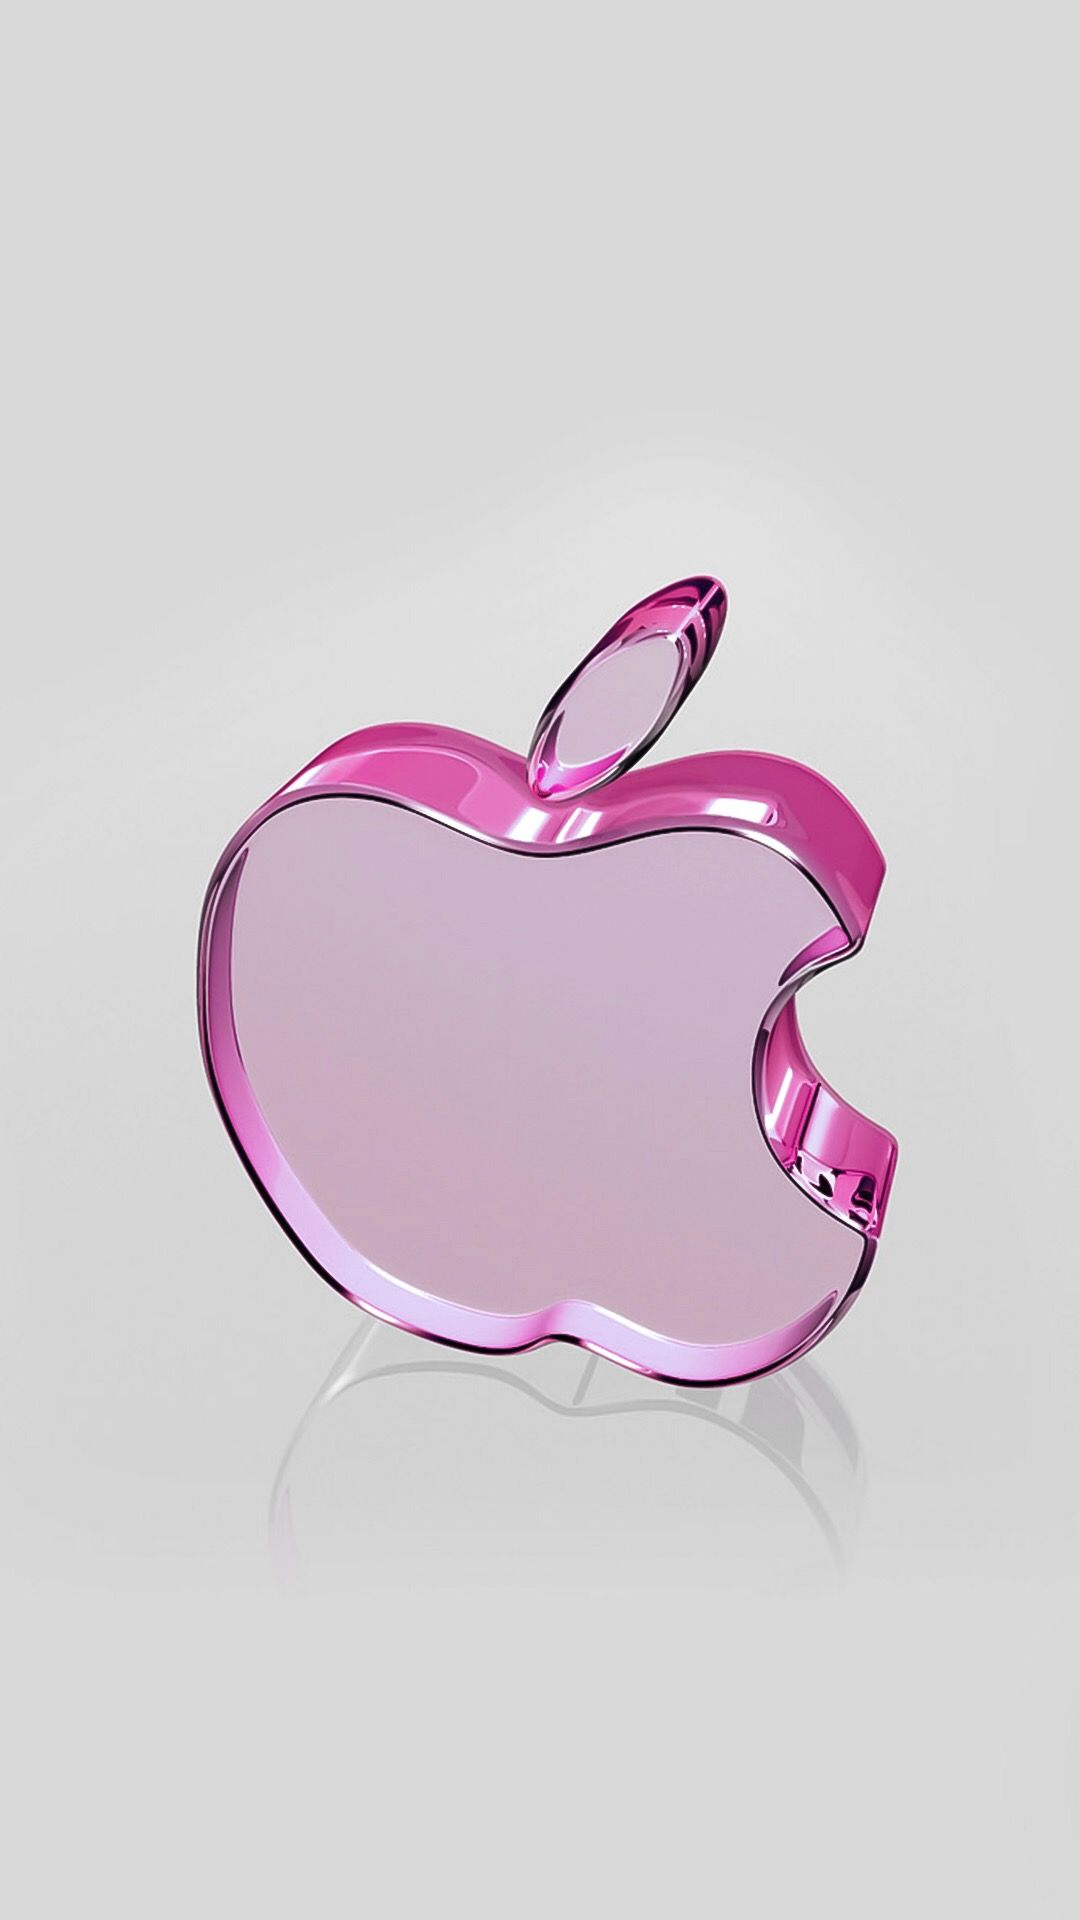 Epingle Par Jade Tsiba Sur Backgrounds Fond D Ecran Telephone Fond D Ecran Iphone Pastel Fond D Ecran Iphone Apple